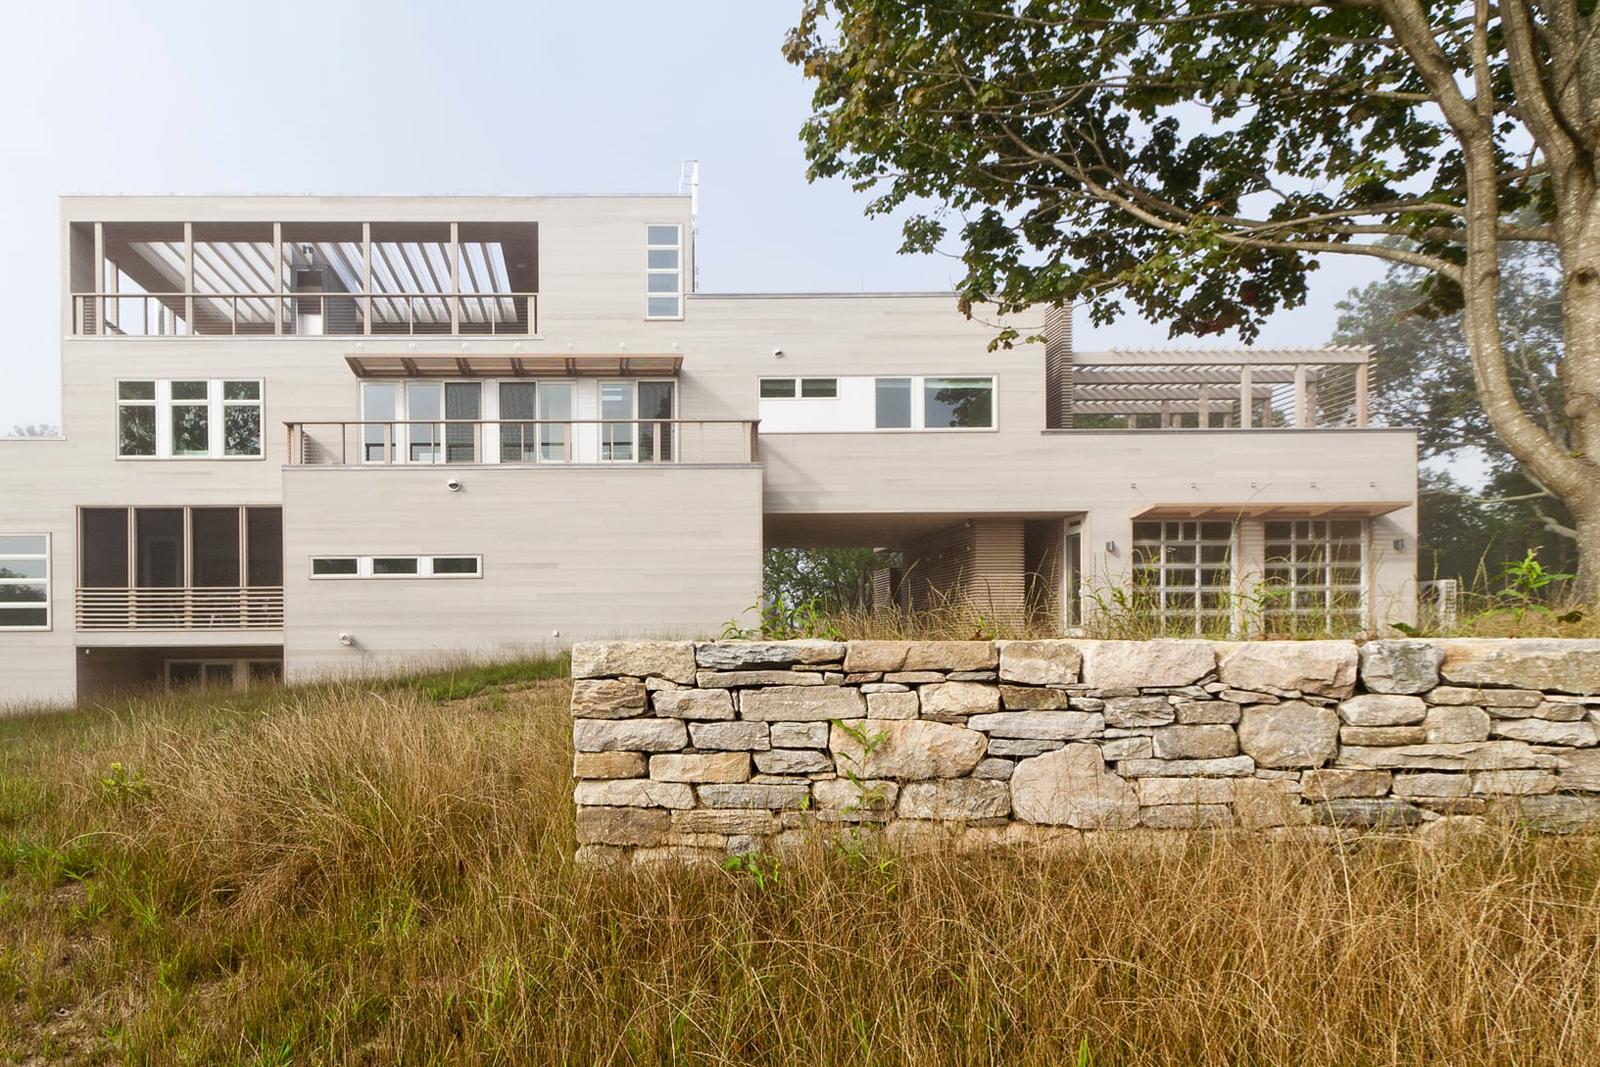 02-res4-resolution-4-architecture-modern-modular-home-prefab-house-fishers-island-exterior.jpg